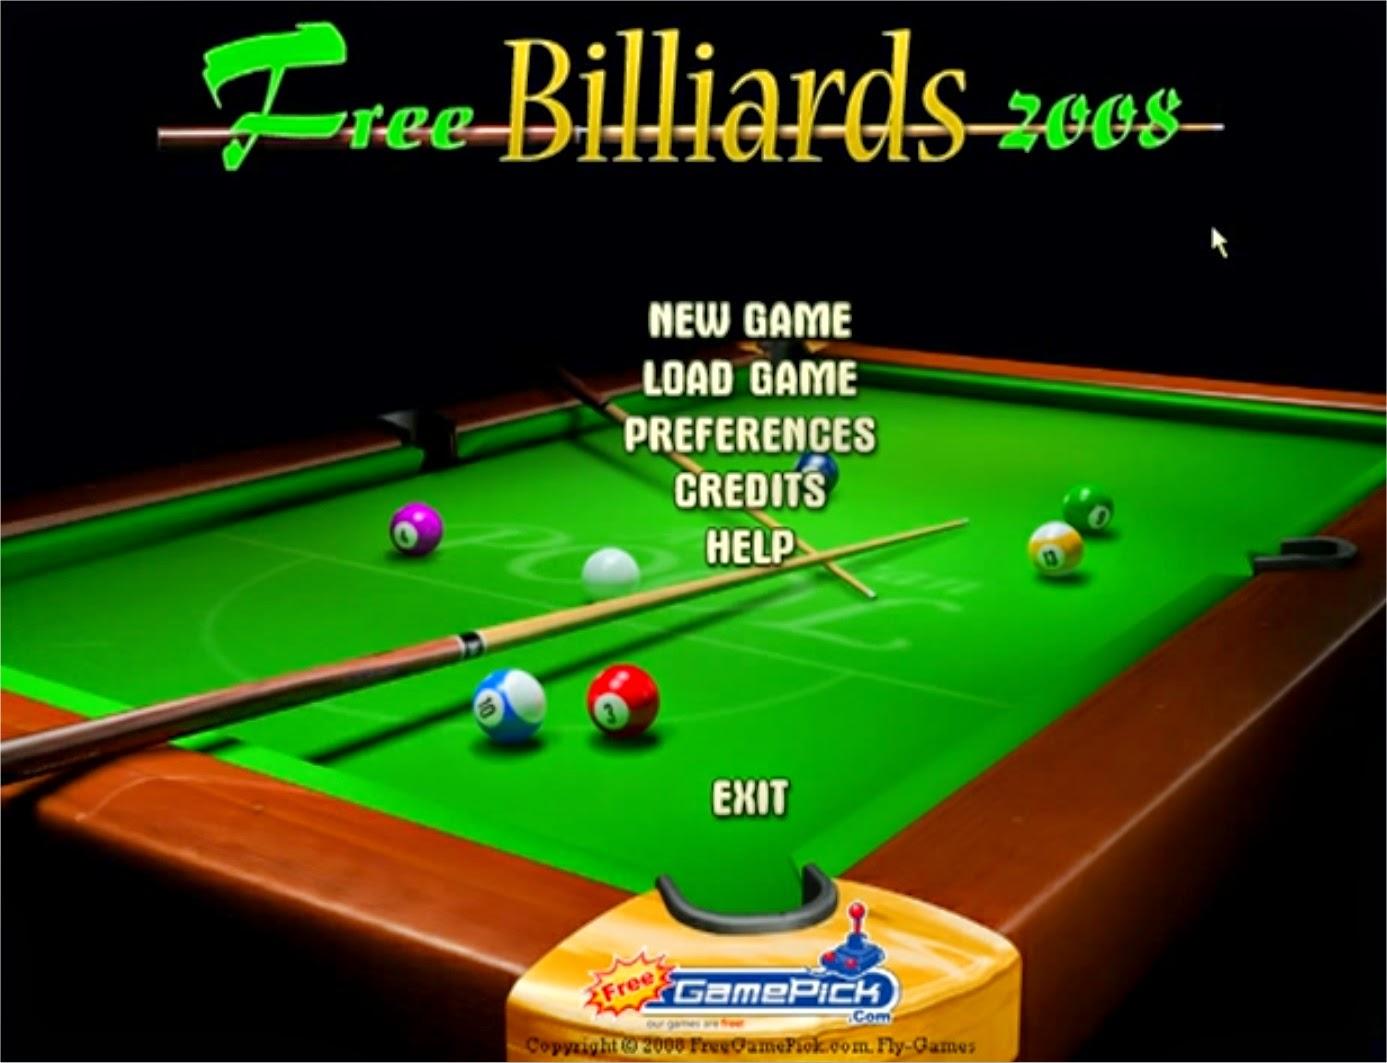 Free Billiards 2008 Logo